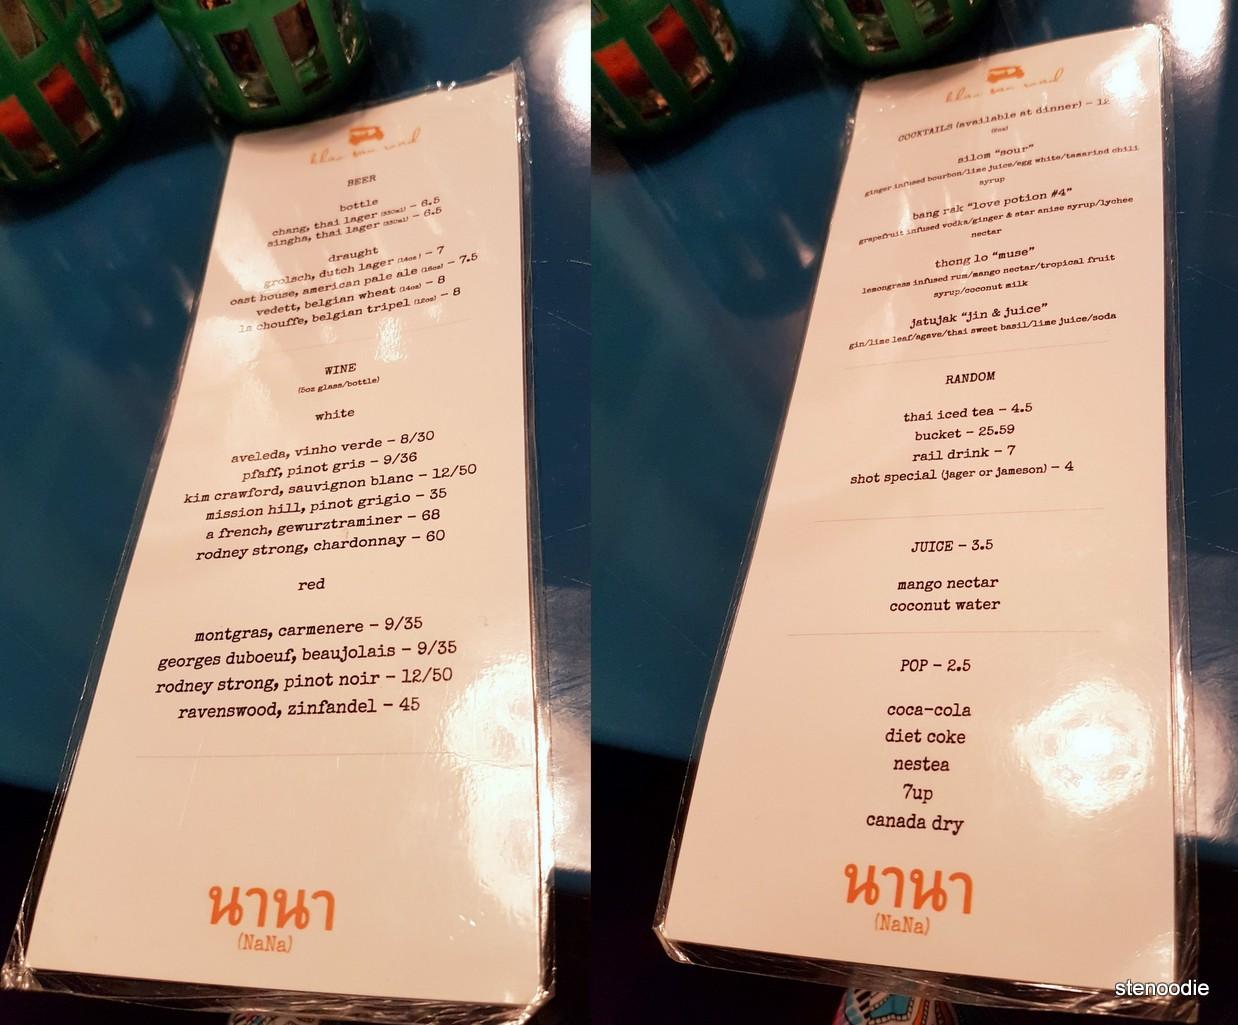 Nana Restaurant drinks menu and prices